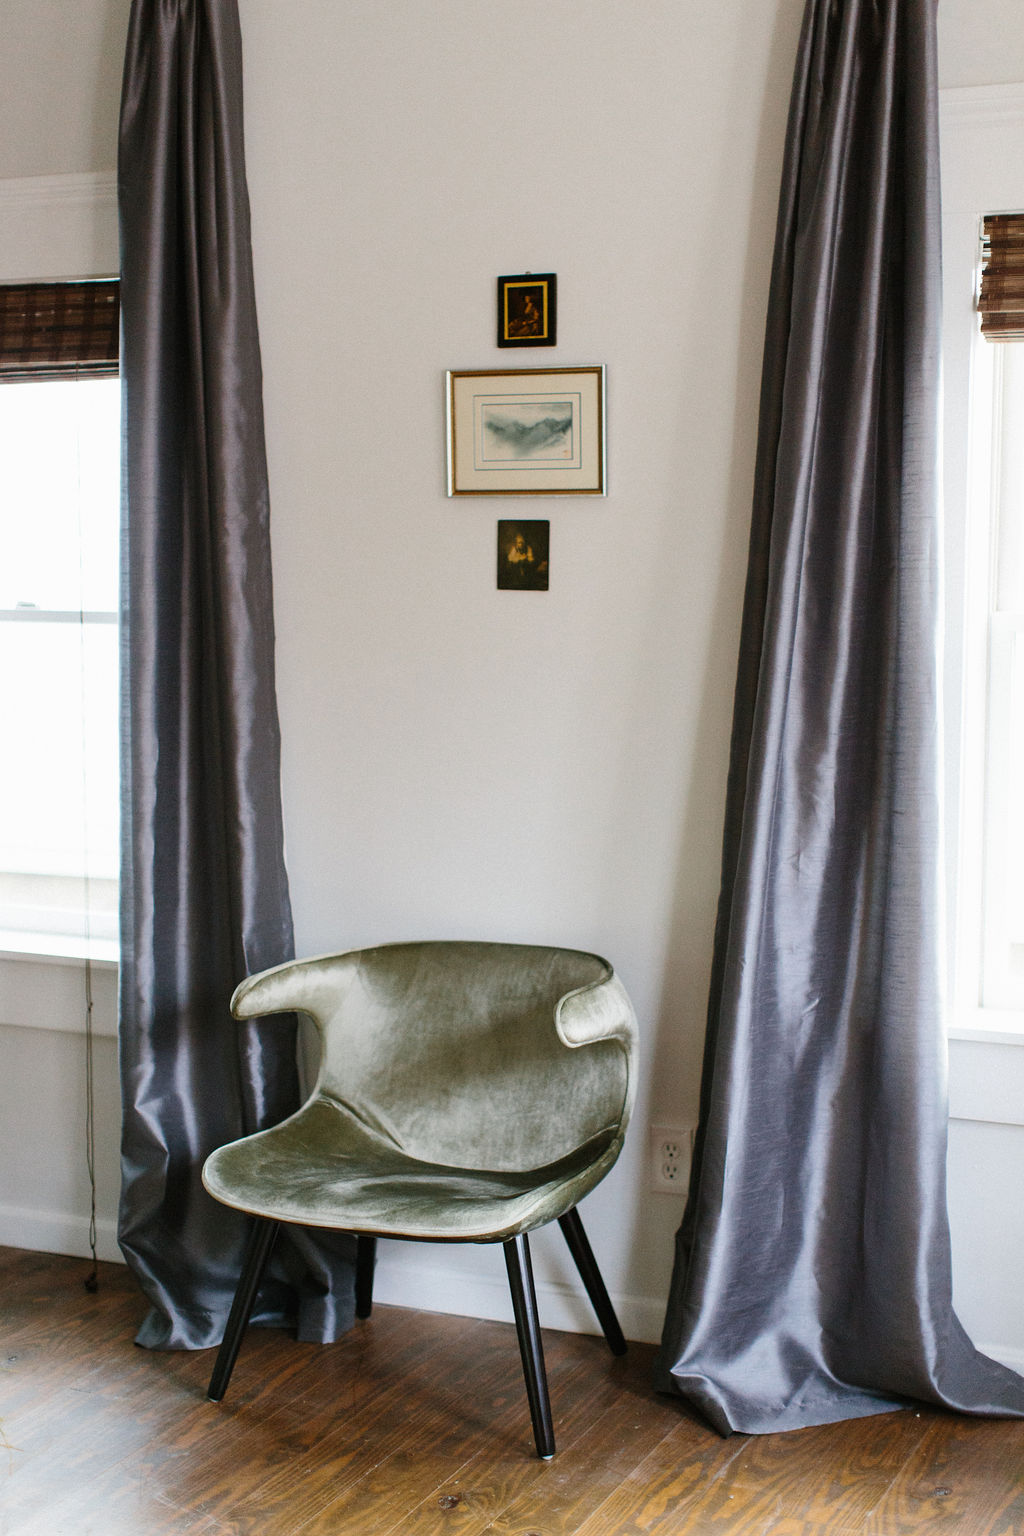 Journey-Jacobs-Design-Studio-Lousiville-Kentucky-Modern-Traditional-Interior-Design-5.JPG